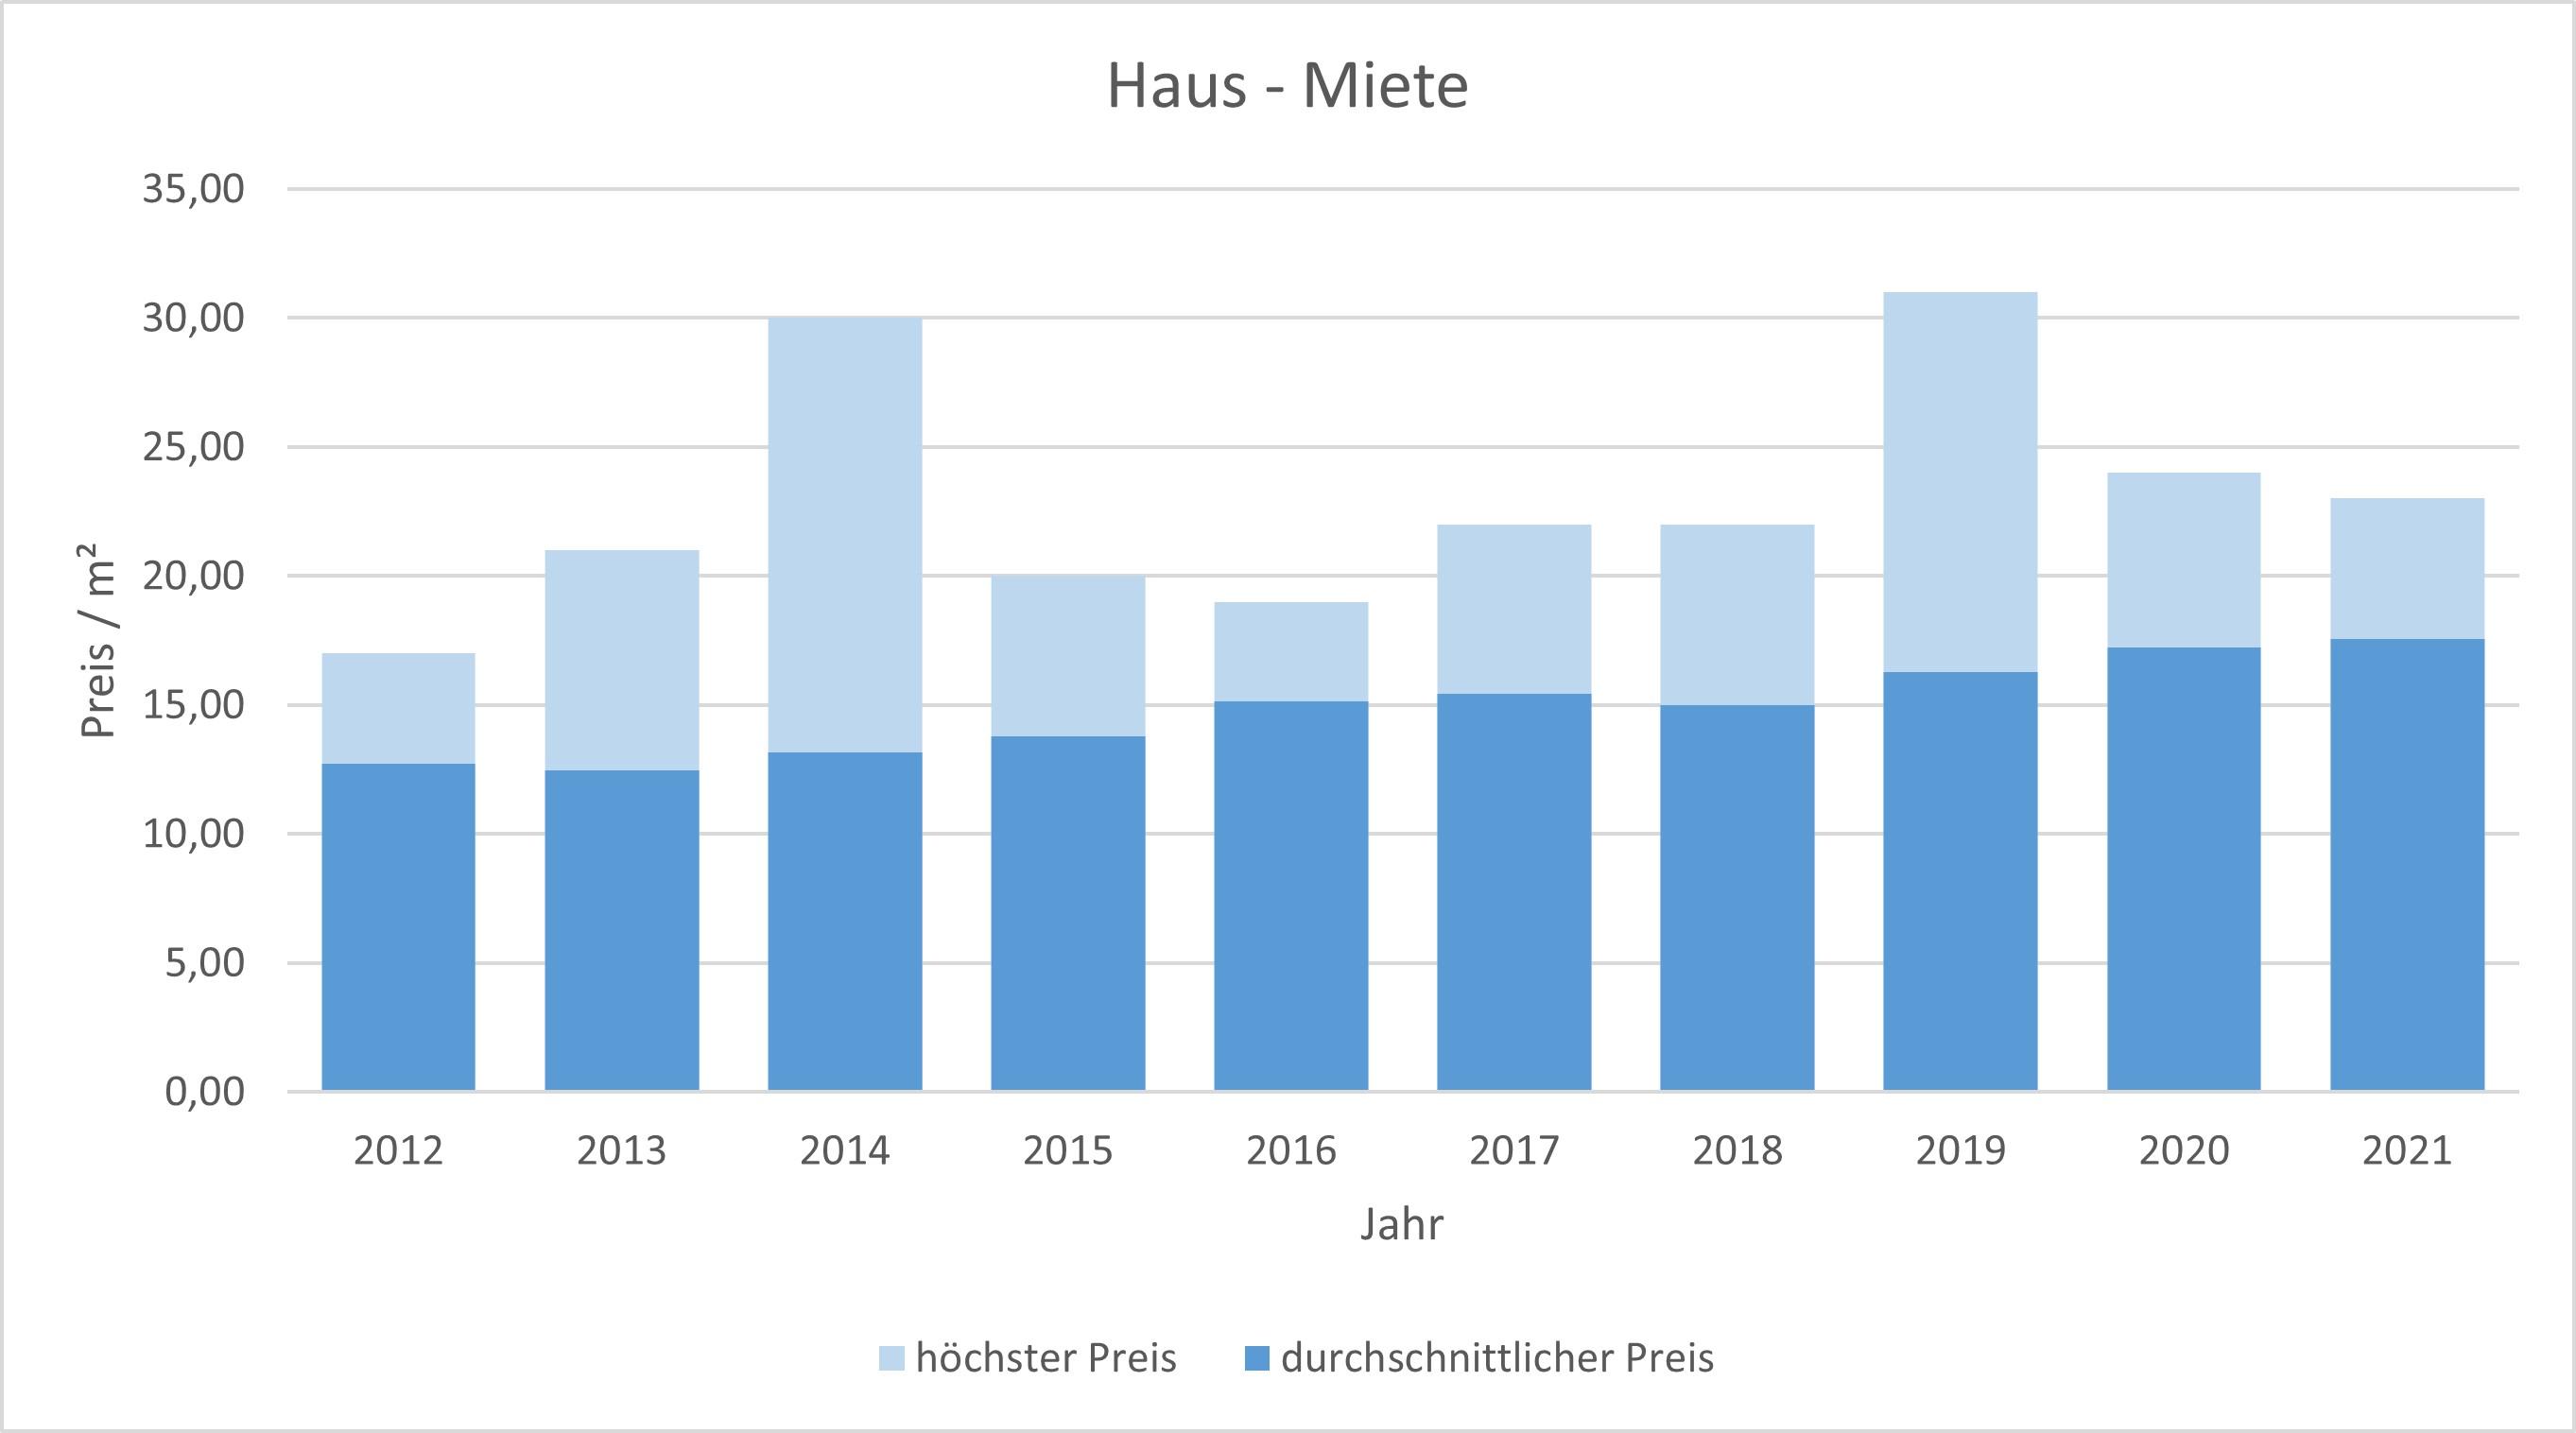 München - Ramersdorf Haus mieten vermieten Preis Bewertung Makler 2019 2020 2021 www.happy-immo.de